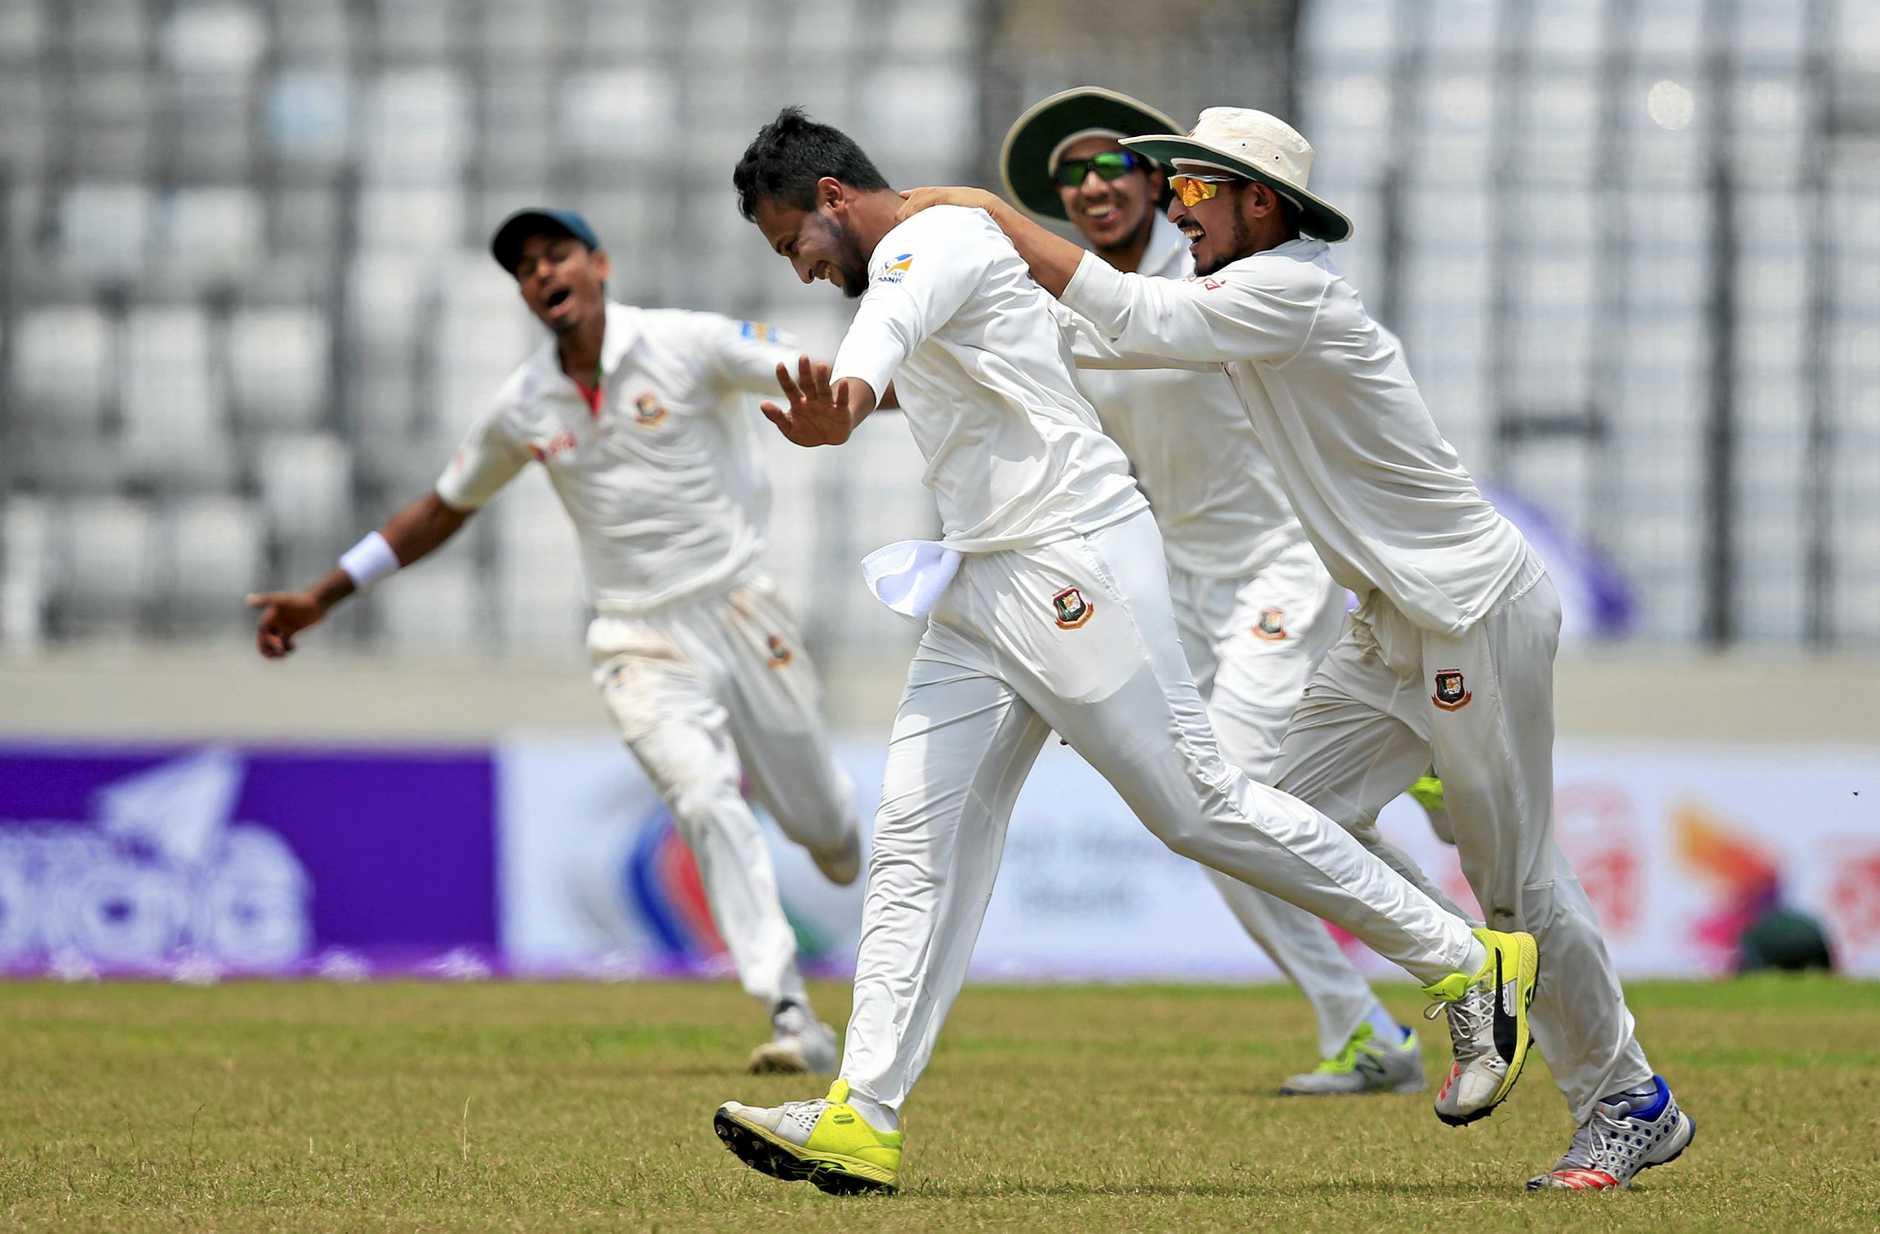 Teammates congratulate Bangladesh's Sakib Al Hasan, second left, after the dismissal of Australia's Glenn Maxwell